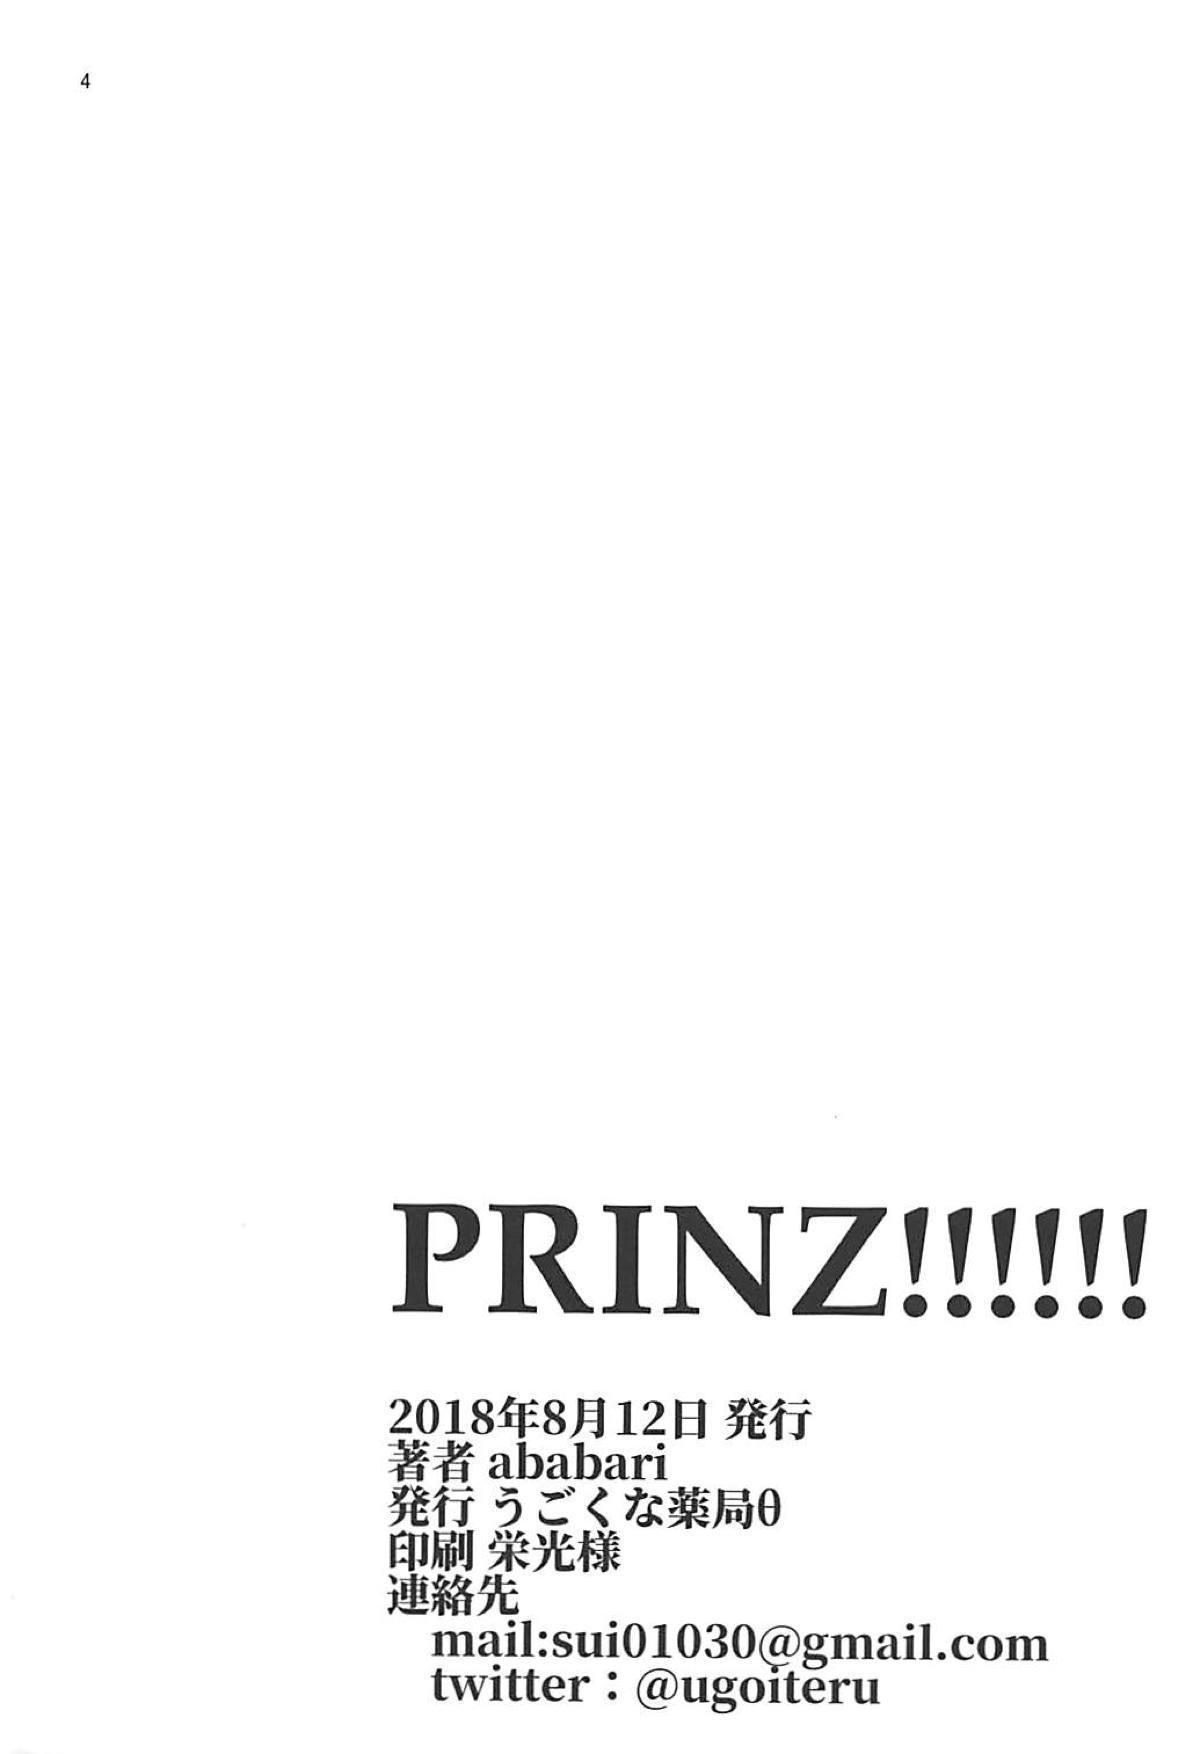 PRINZ!!!!!! 2